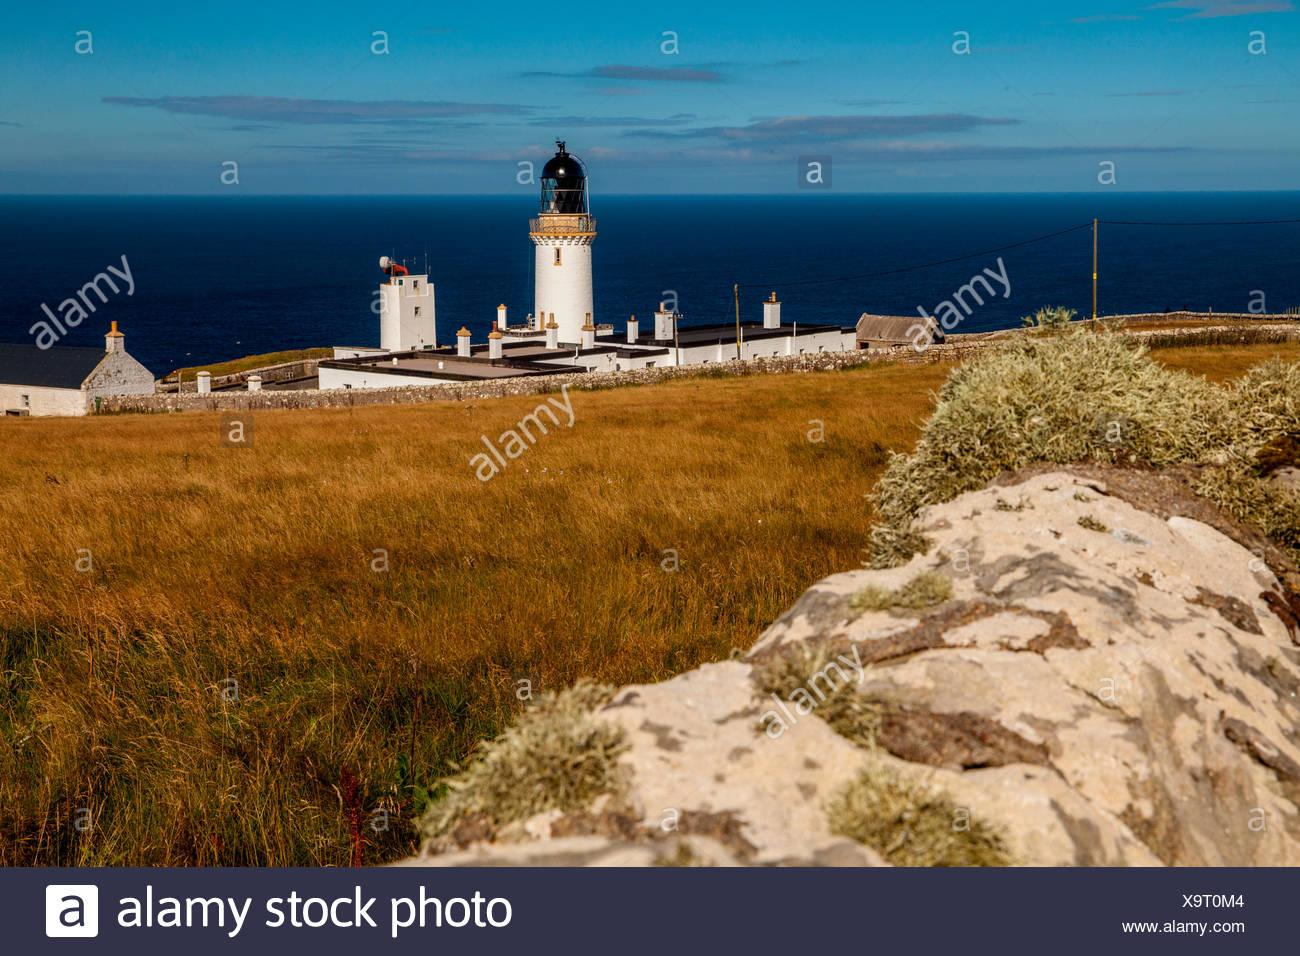 Lighthouse, Dunnet Head, Scotland, UK - Stock Image